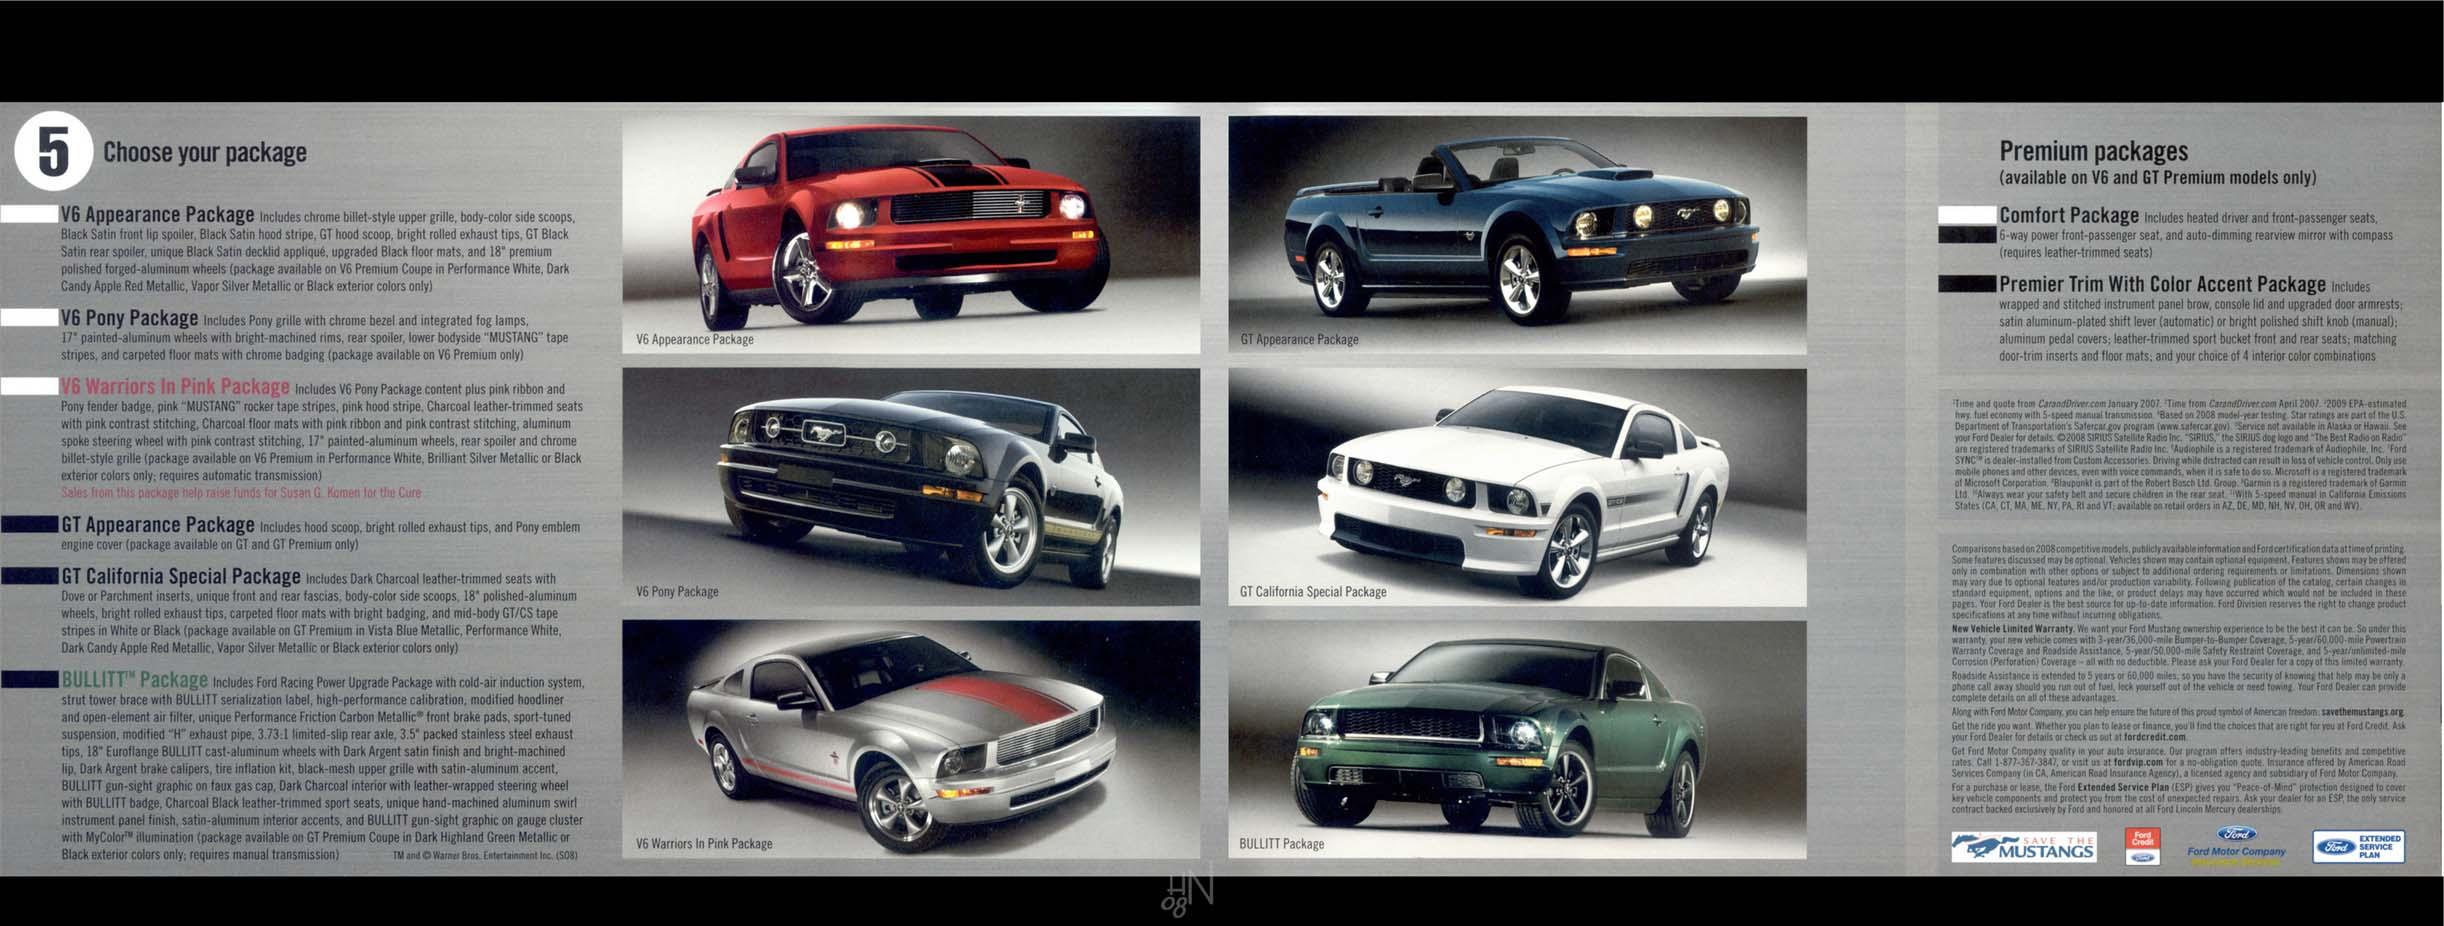 Mustang Ford Carford Matte Black Car Wrap Fort Lauderdale 1964 Brochure 2009